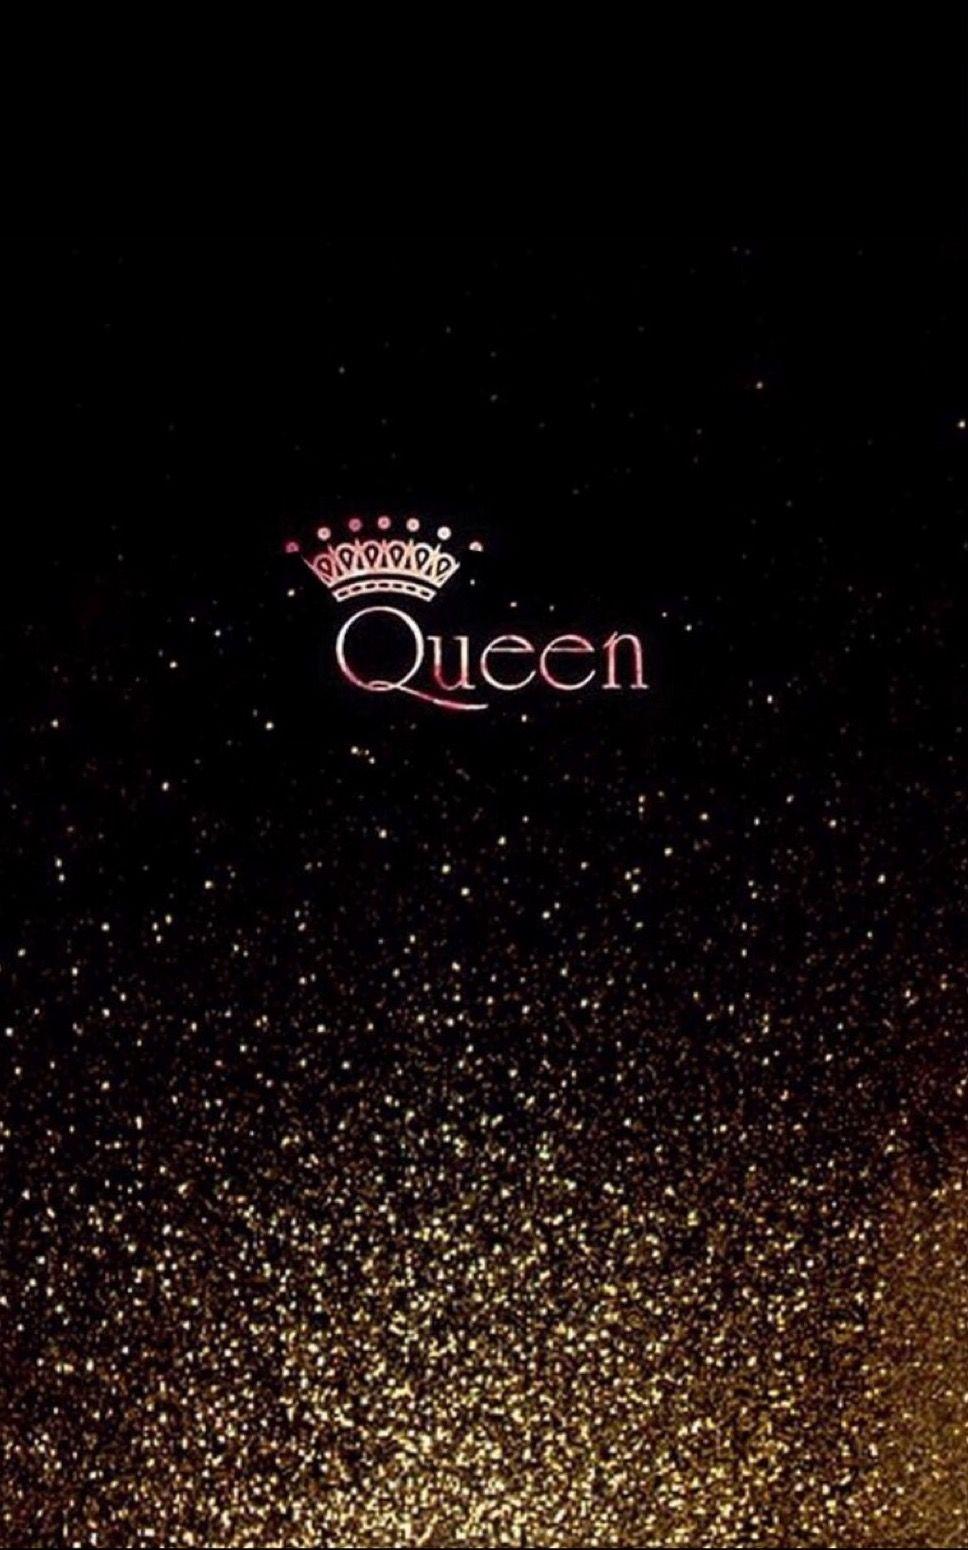 Queen With Glitter Wallpaper Queens Wallpaper Black Wallpaper Iphone Glitter Wallpaper